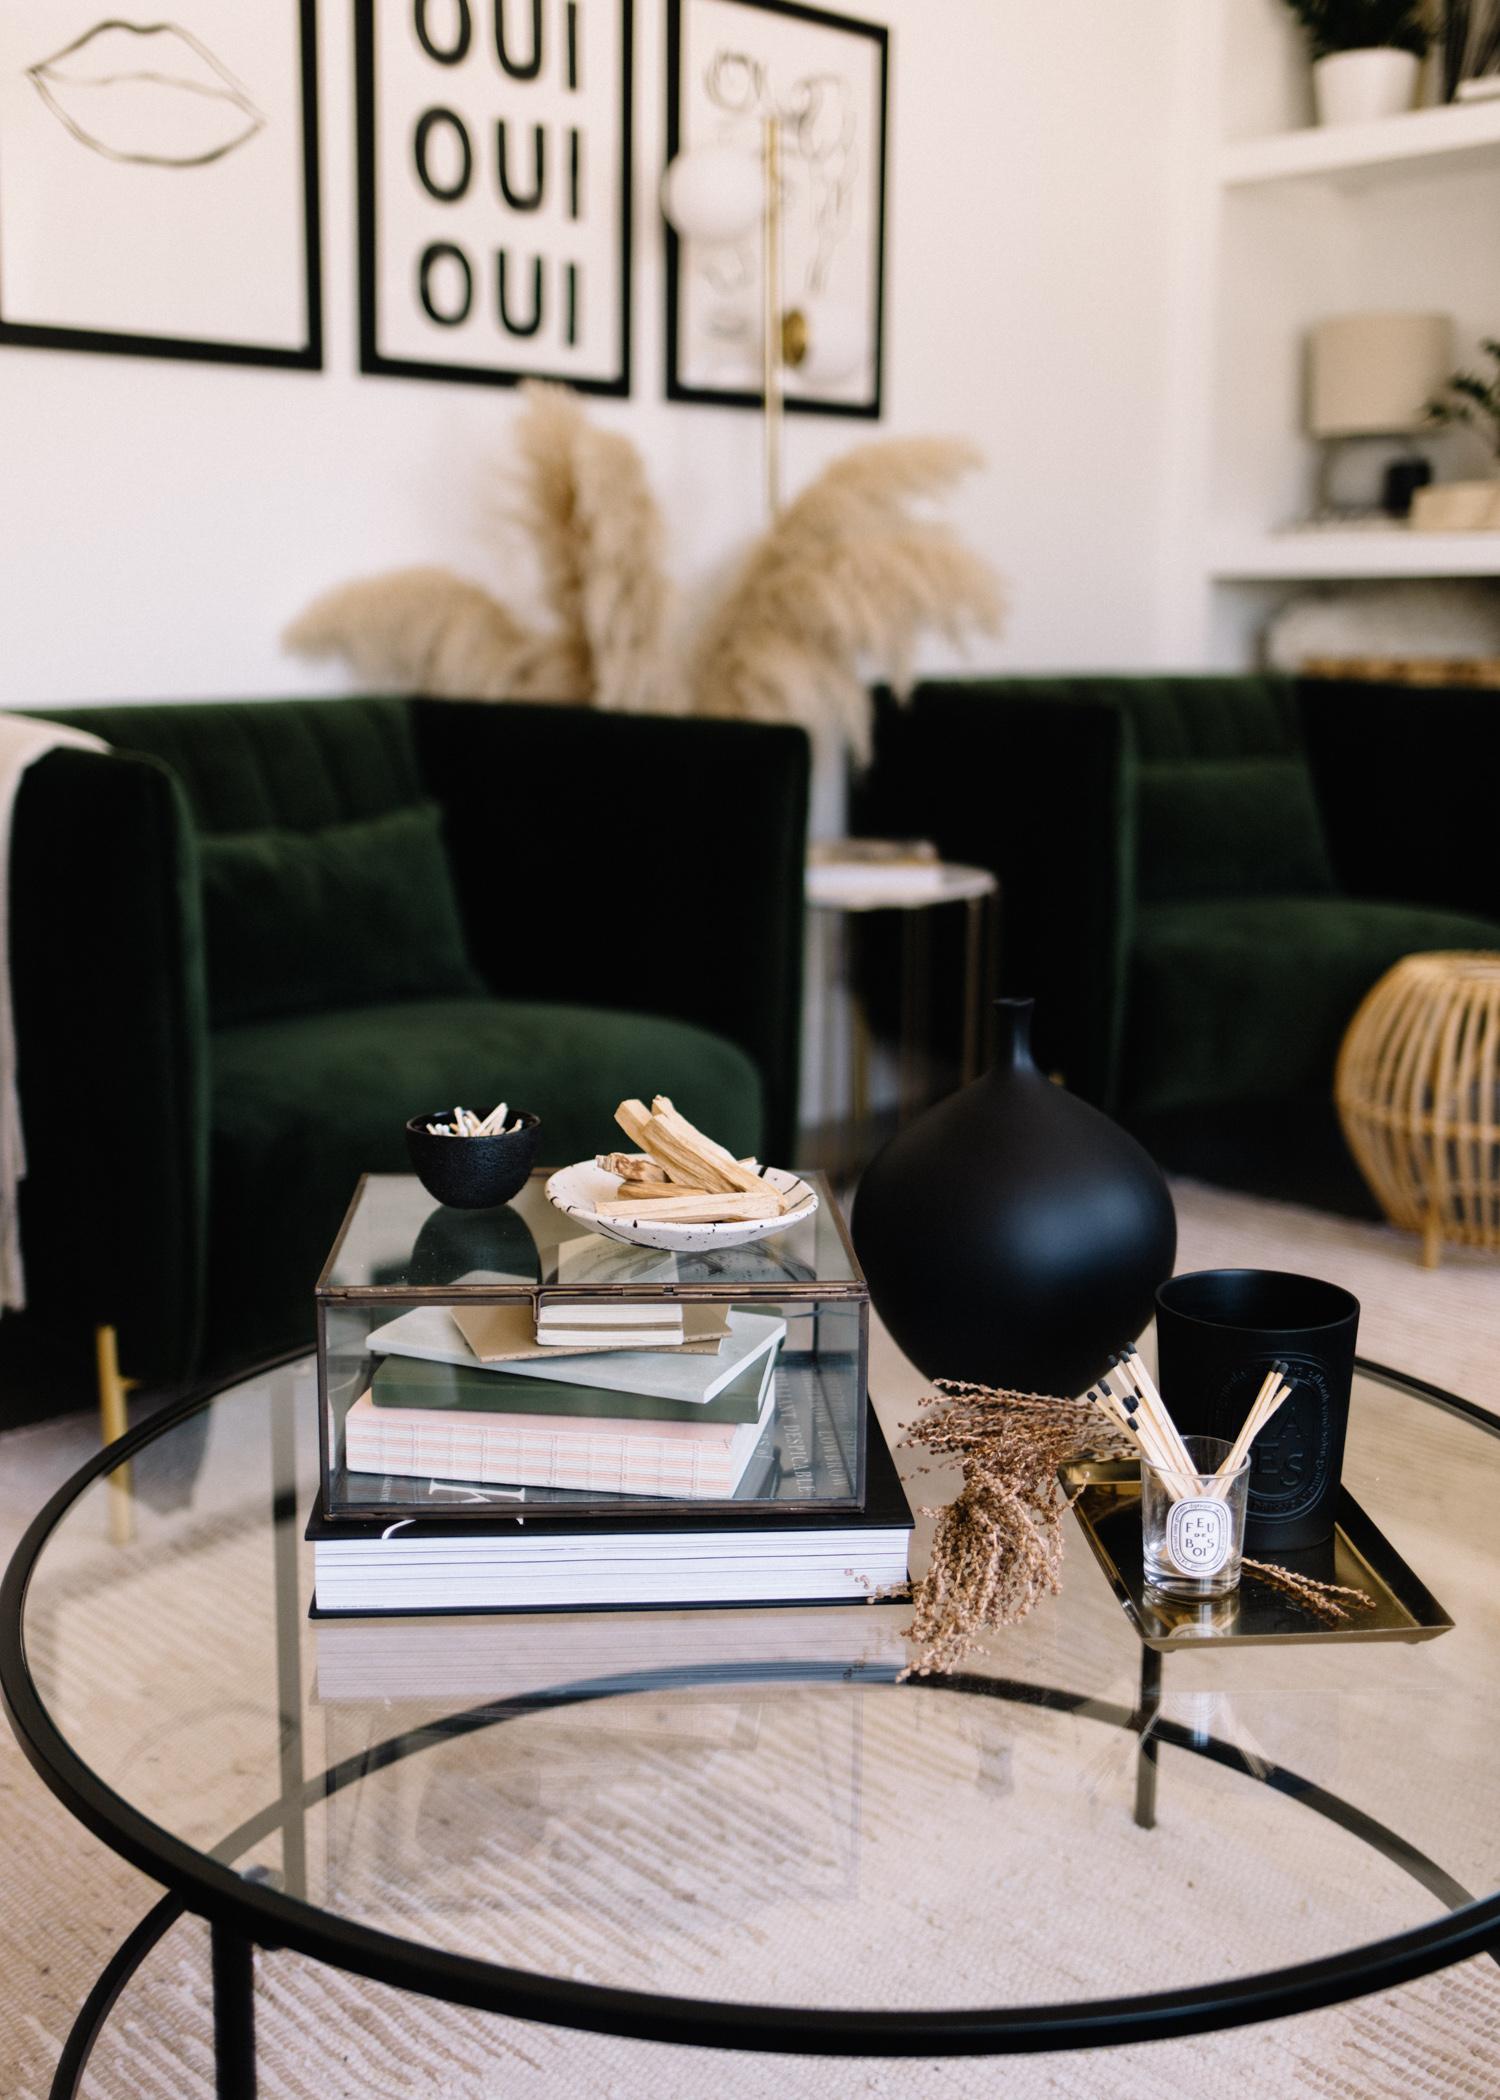 Minimalist Coffee Table Styling - A Fabulous Fete